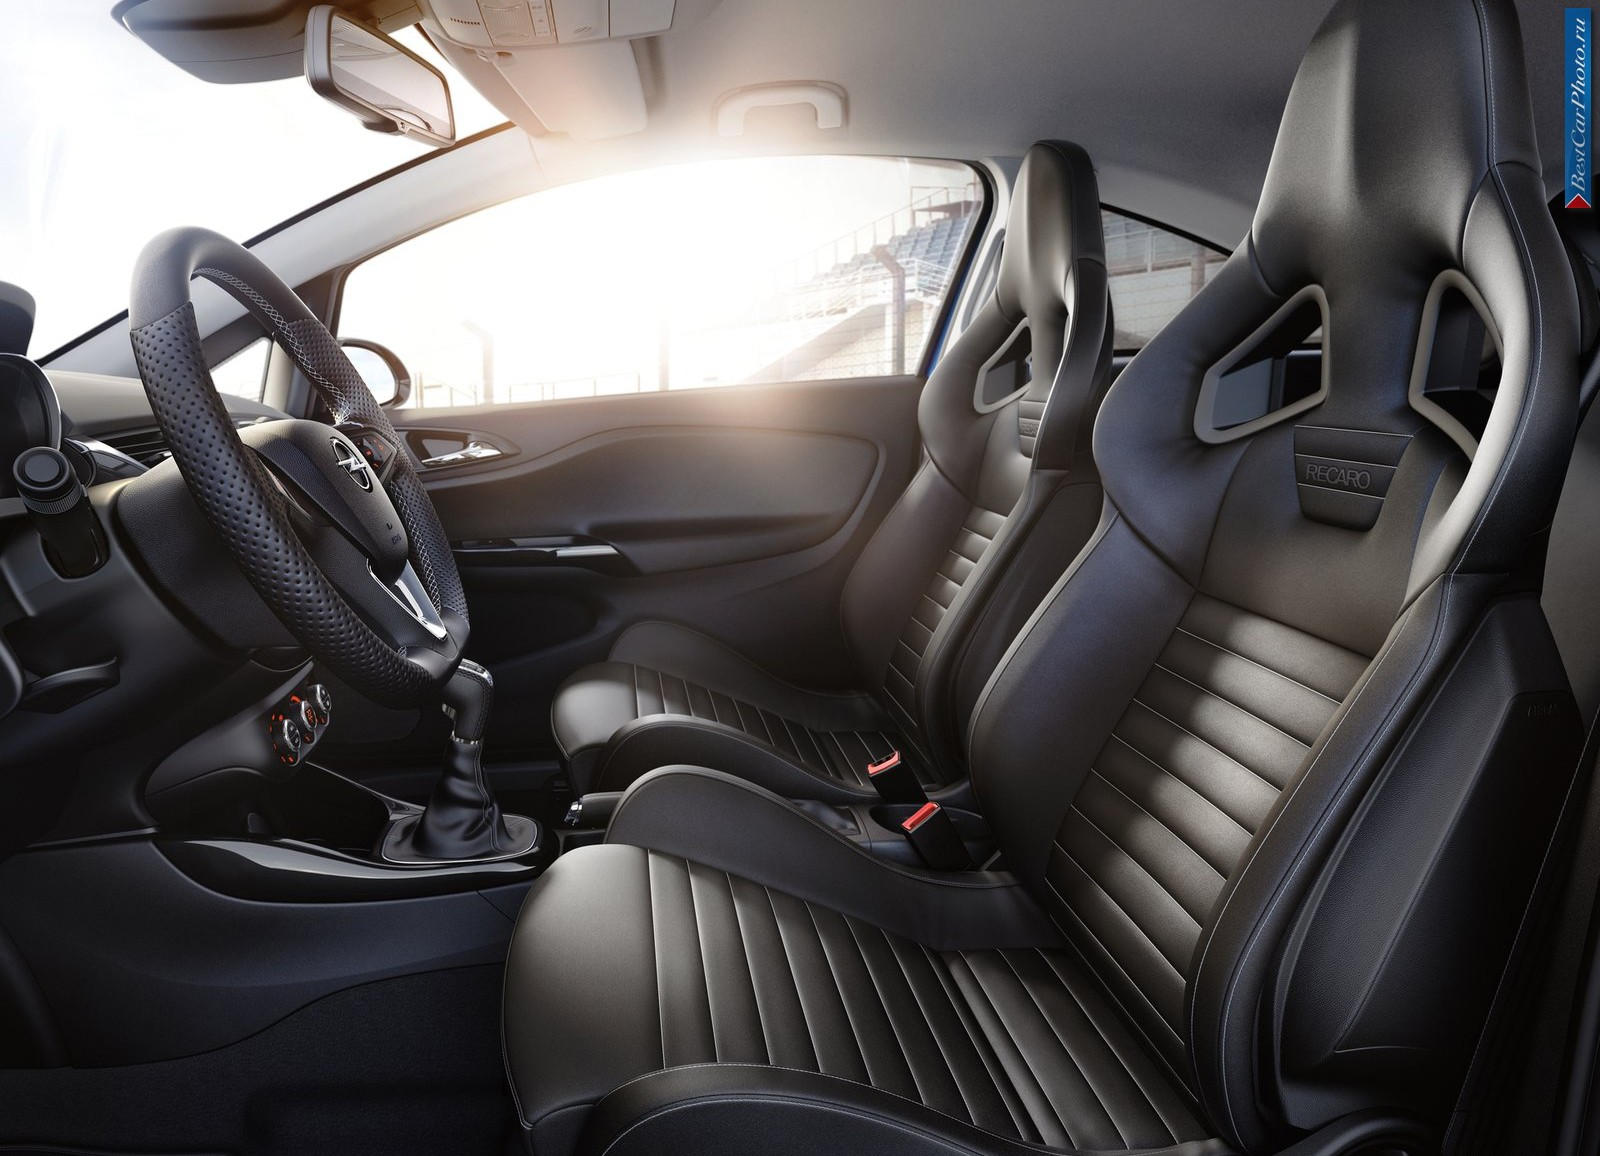 Opel Corsa S салон